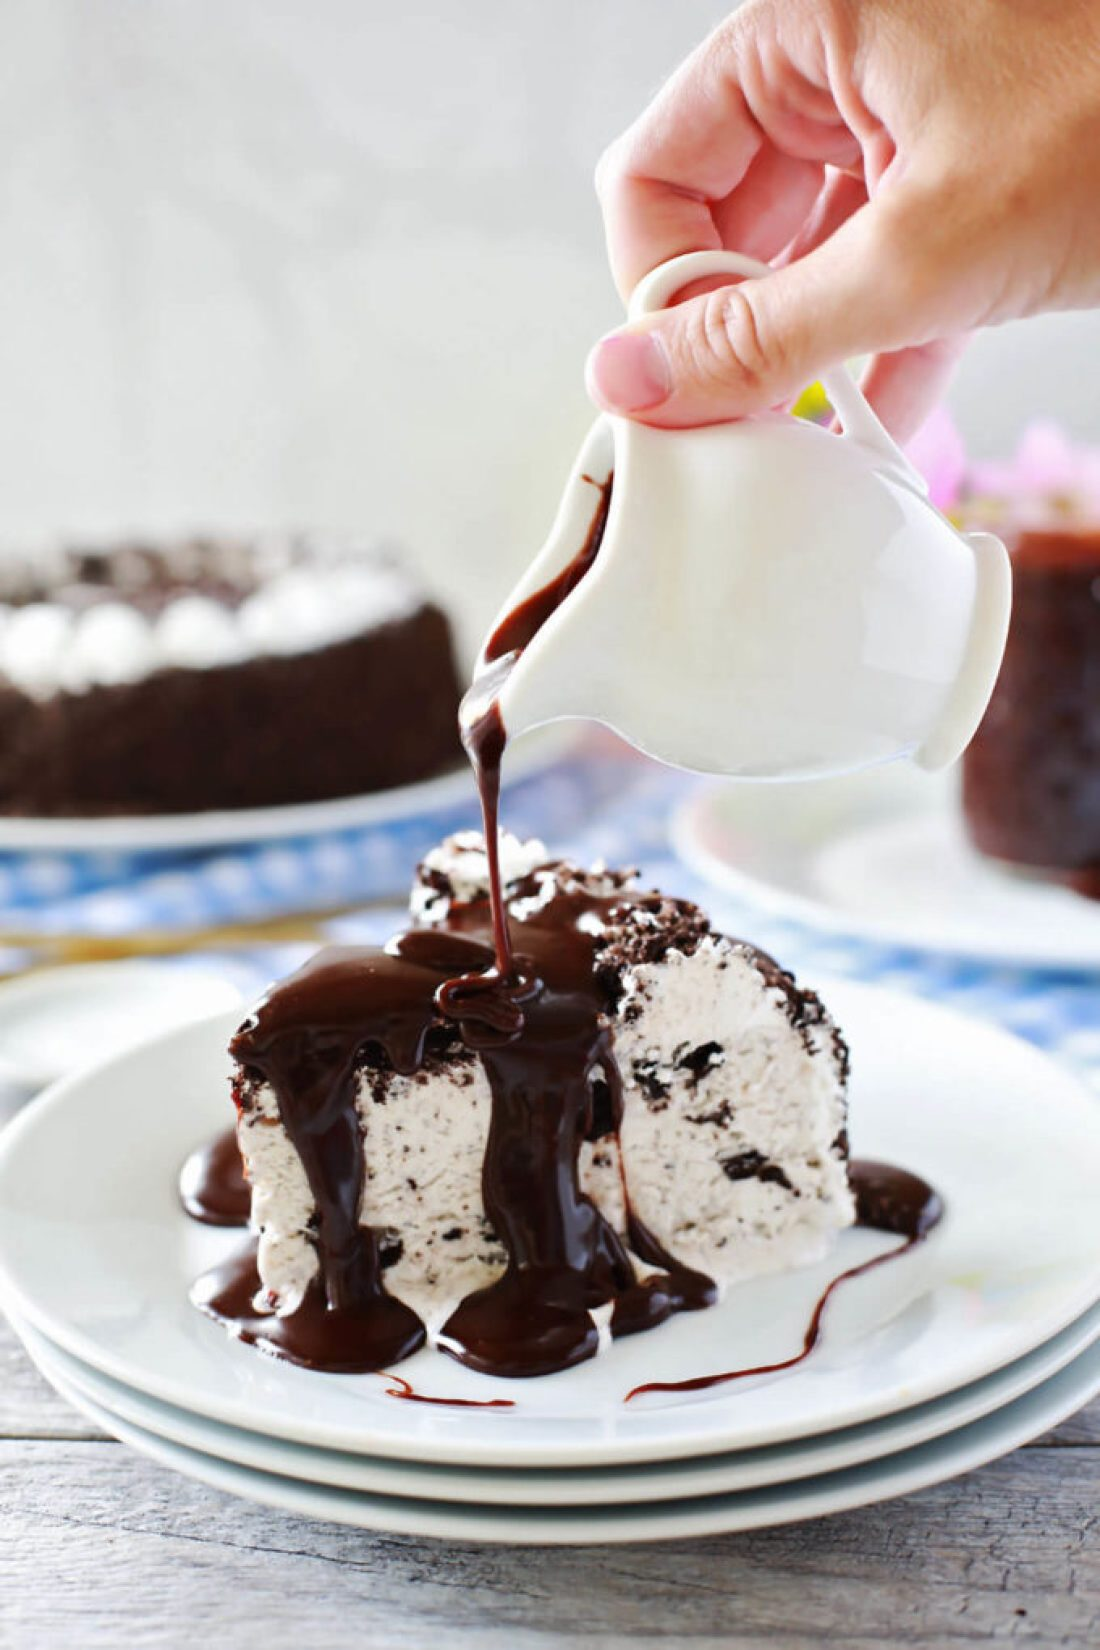 Chocolate Hazelnut Hot Fudge Sauce on ice cream cake